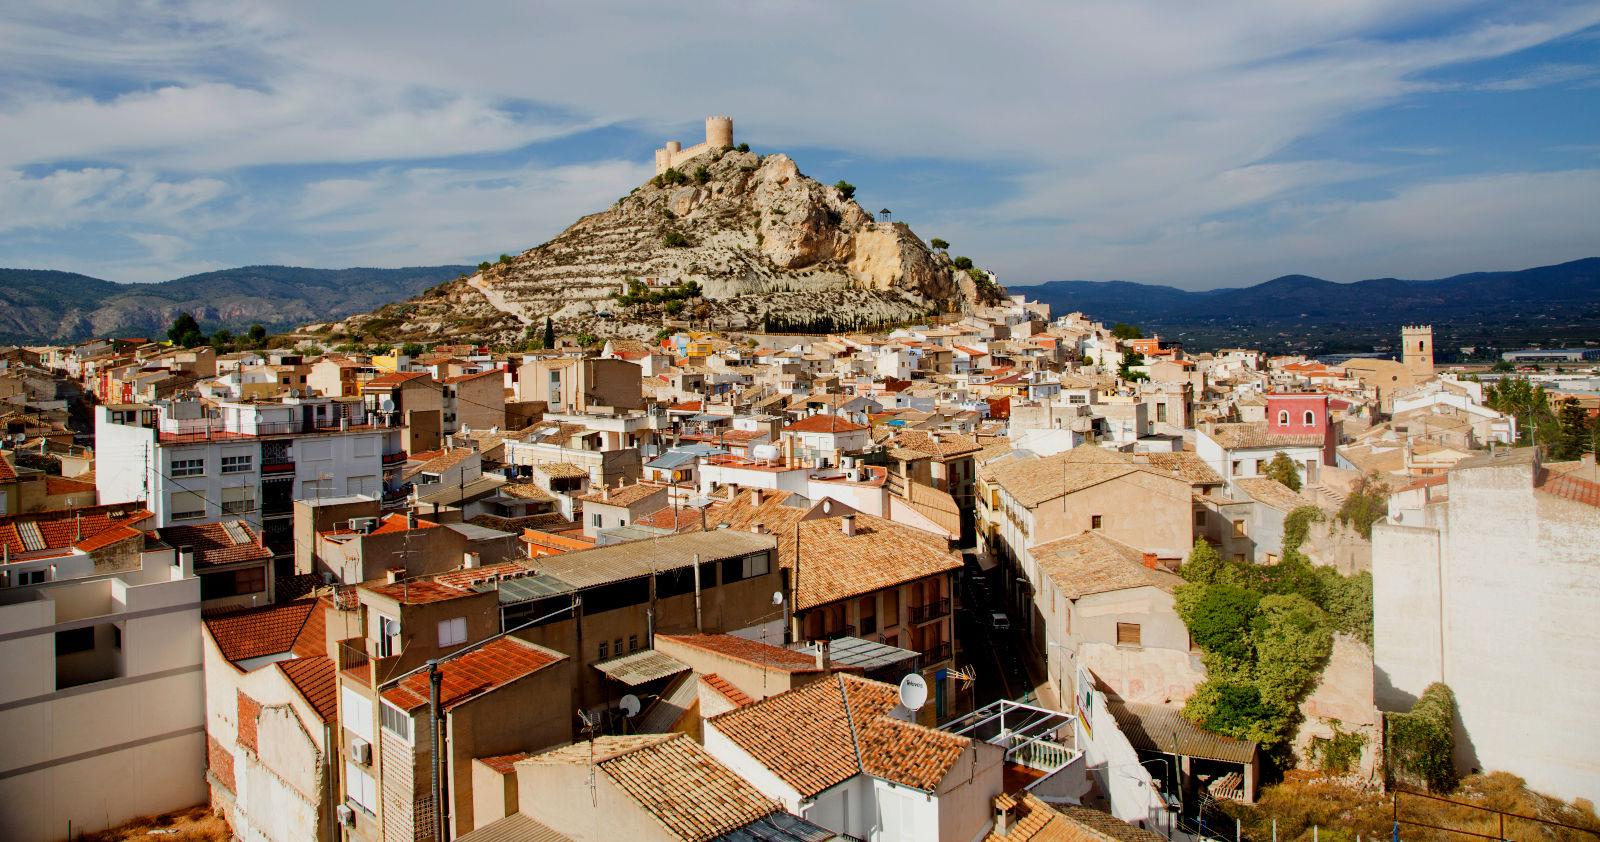 Fuente: www.feriasanisidrocastalla.com